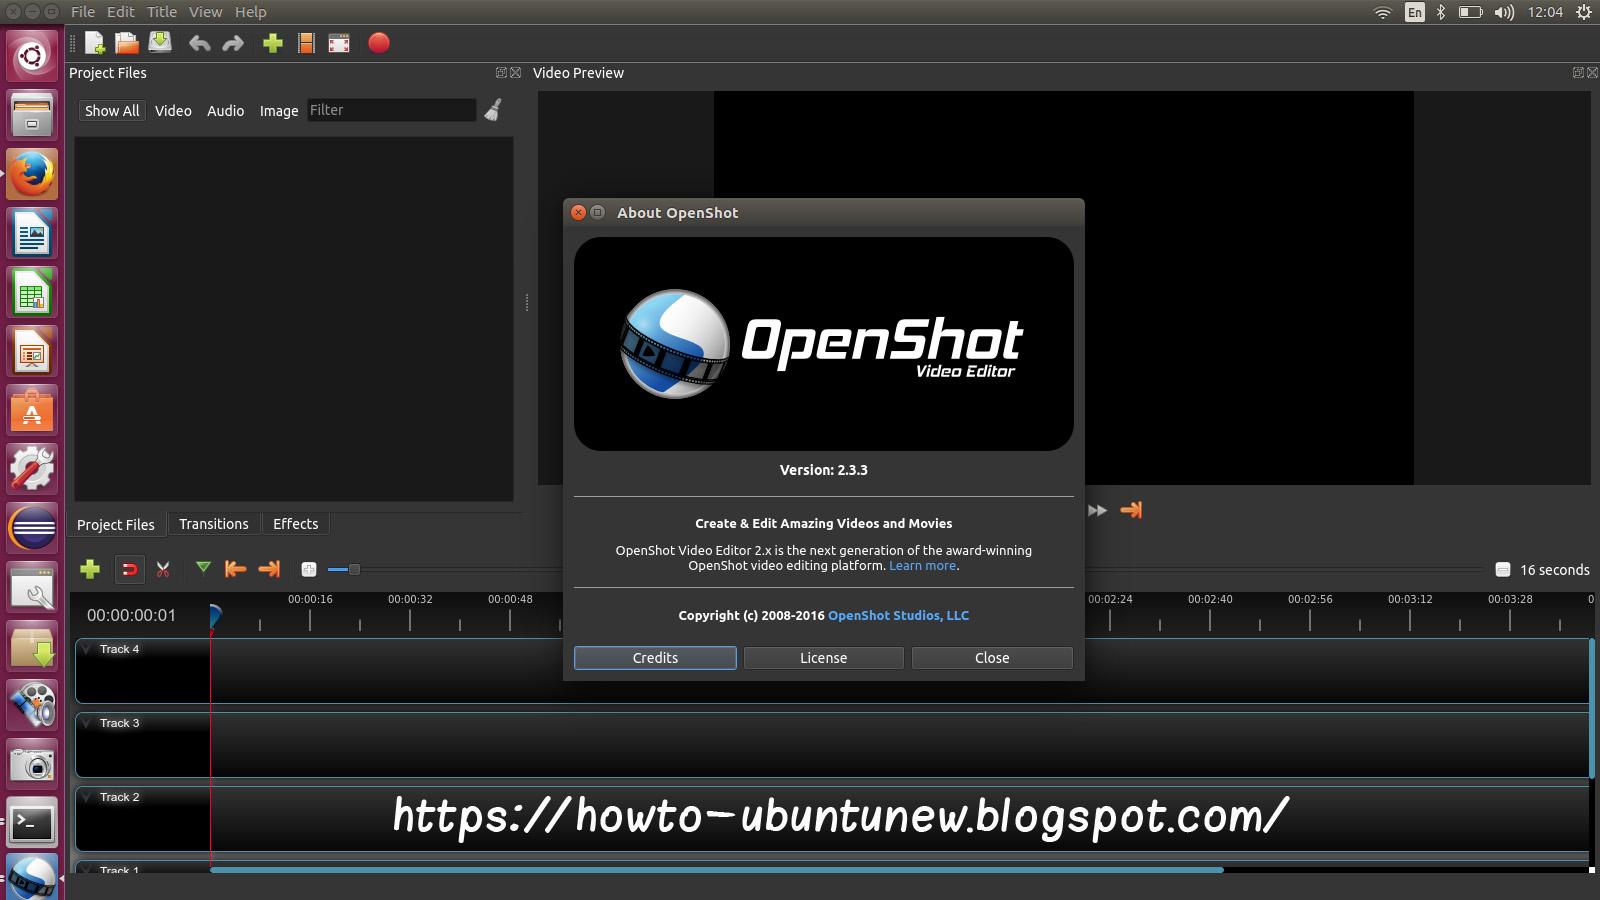 How to install program on Ubuntu: How To Install OpenShot